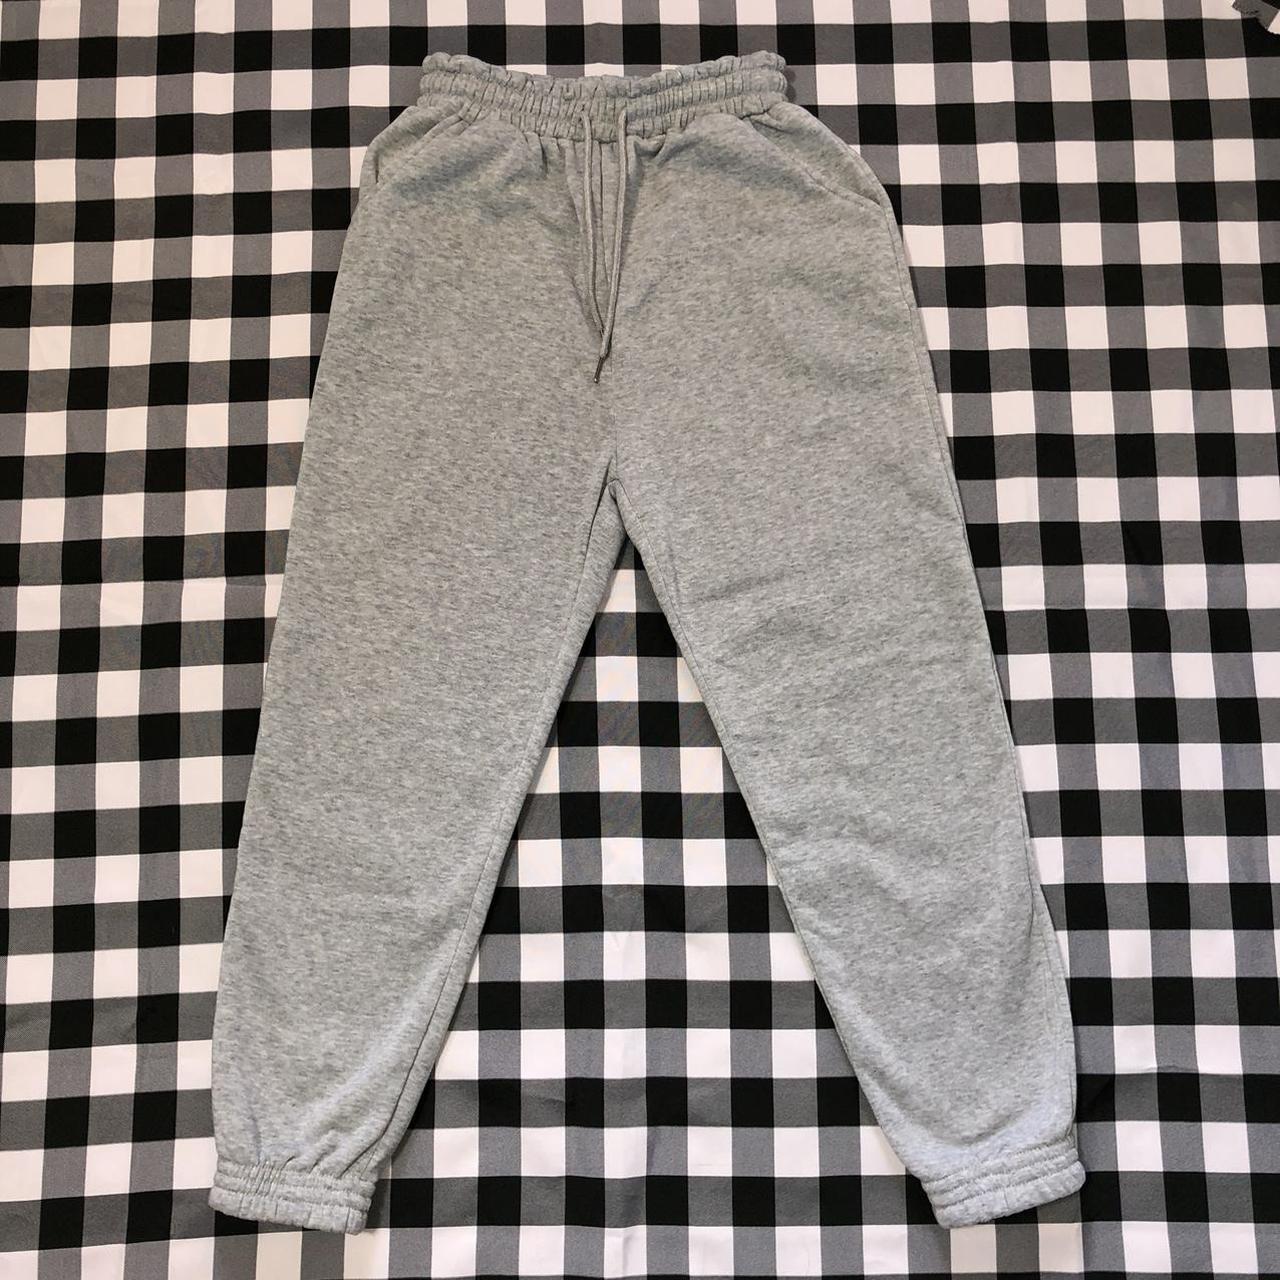 Product Image 1 - Shein grey high ruffled sweatpants